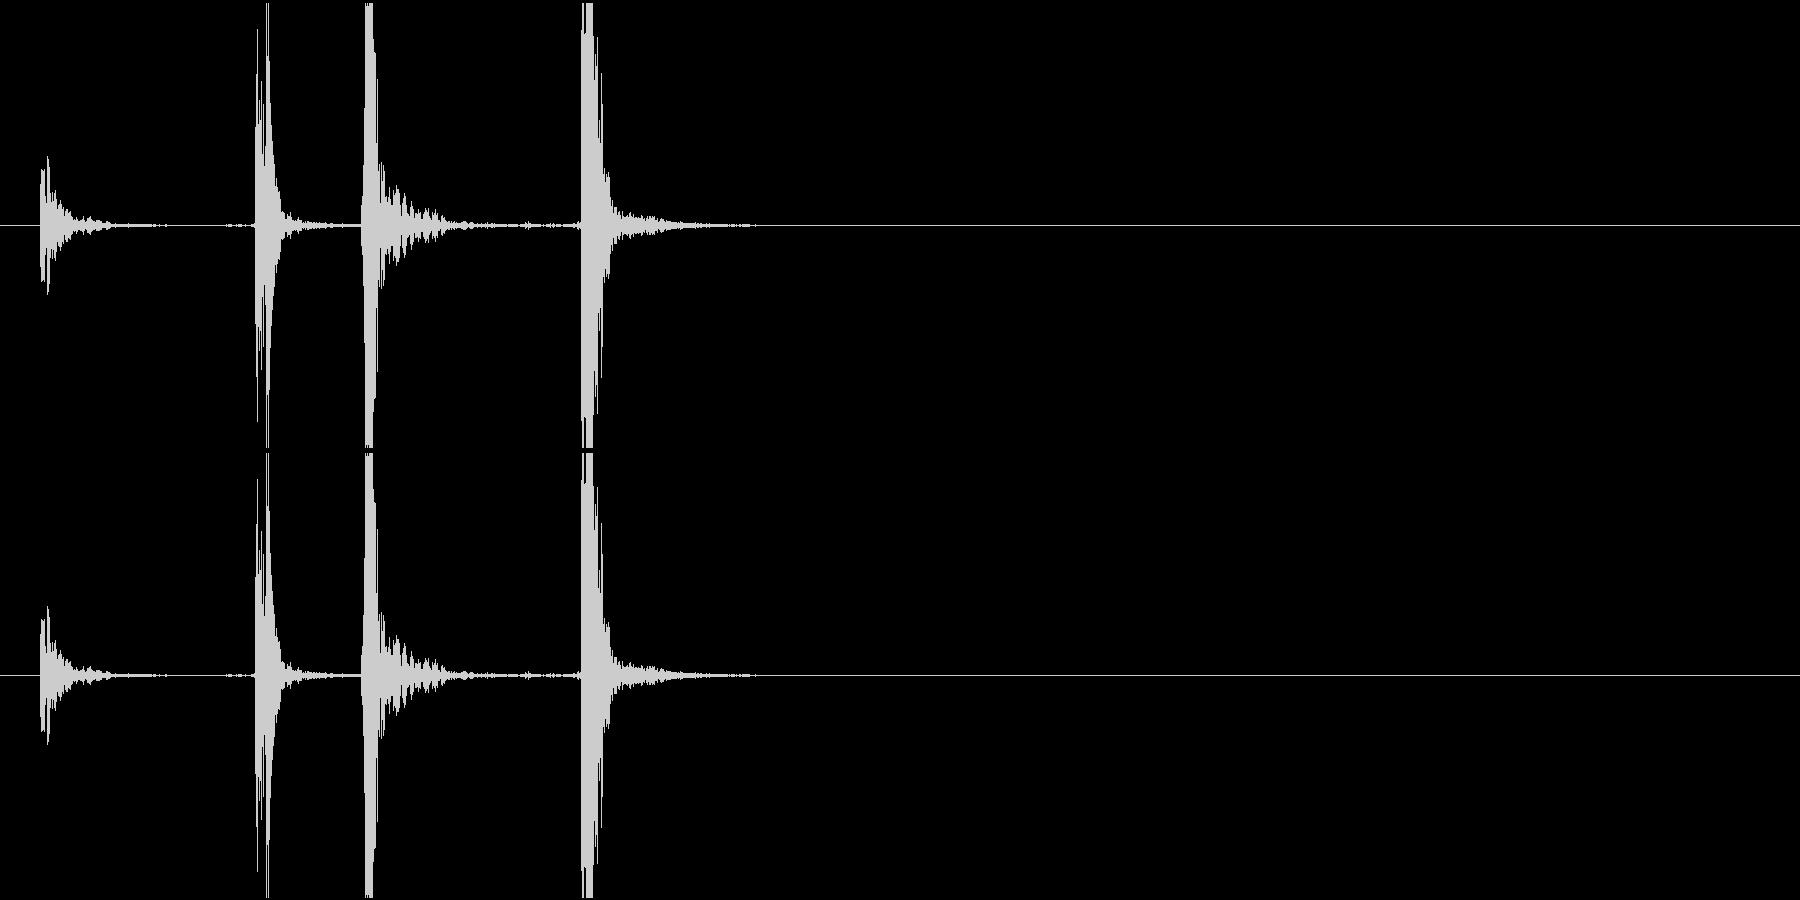 Typing パチパチ 2連打 キー音の未再生の波形